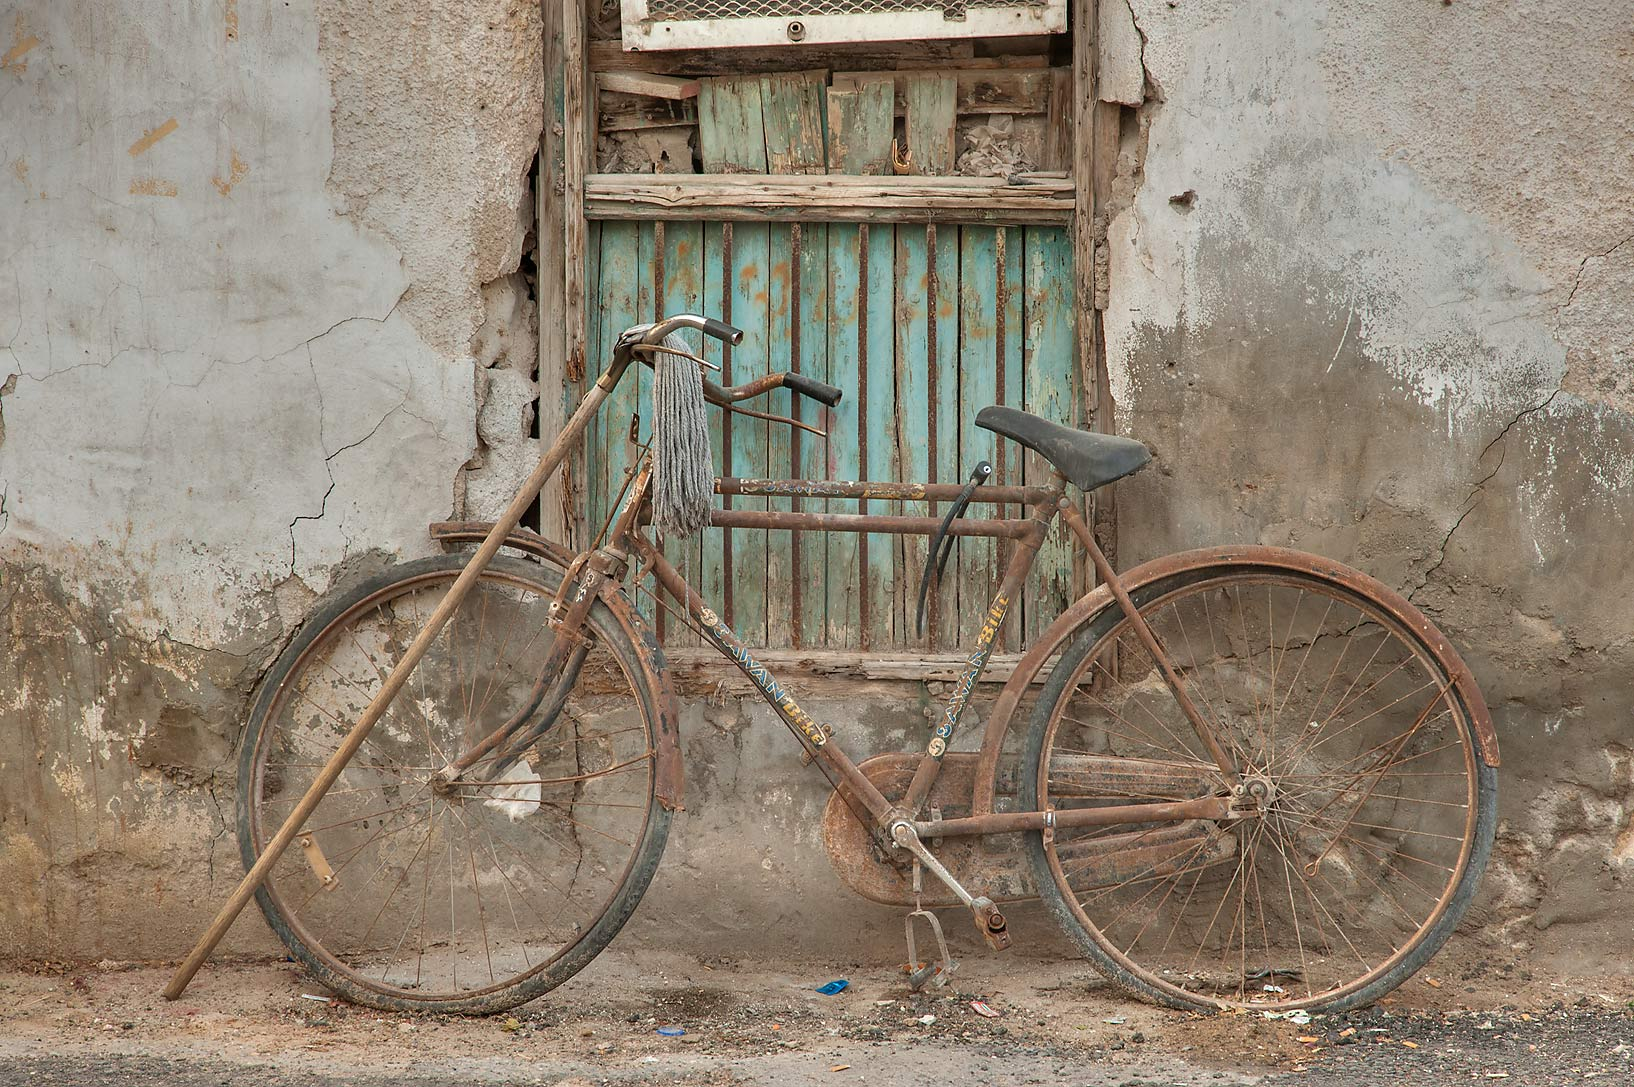 Photo 1378-24: Rusty bicycle on Zurara Bin Amir St. in Al ...